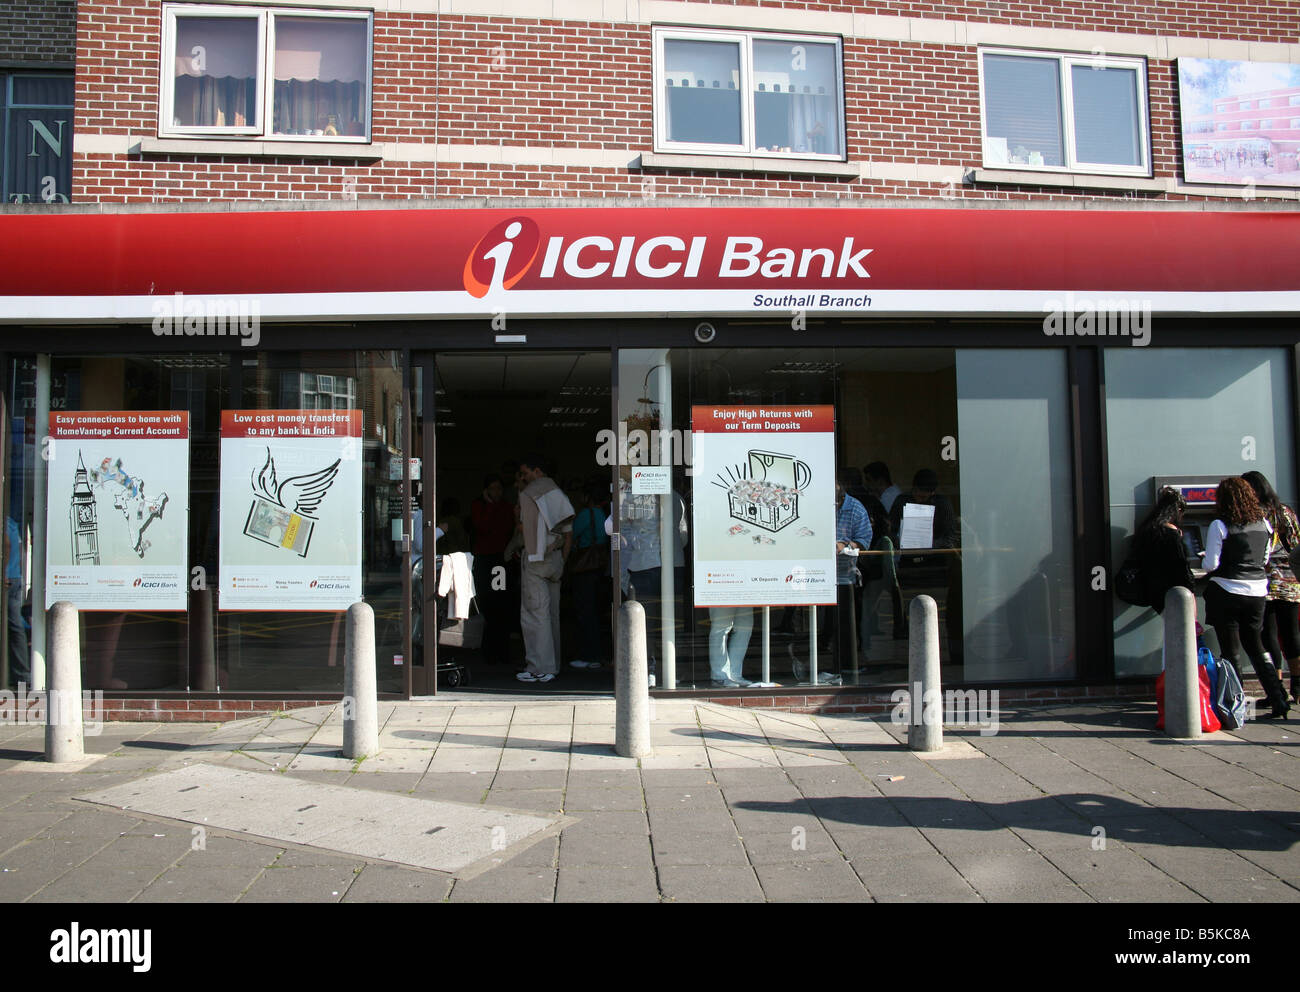 united bank of india branch in south kolkata